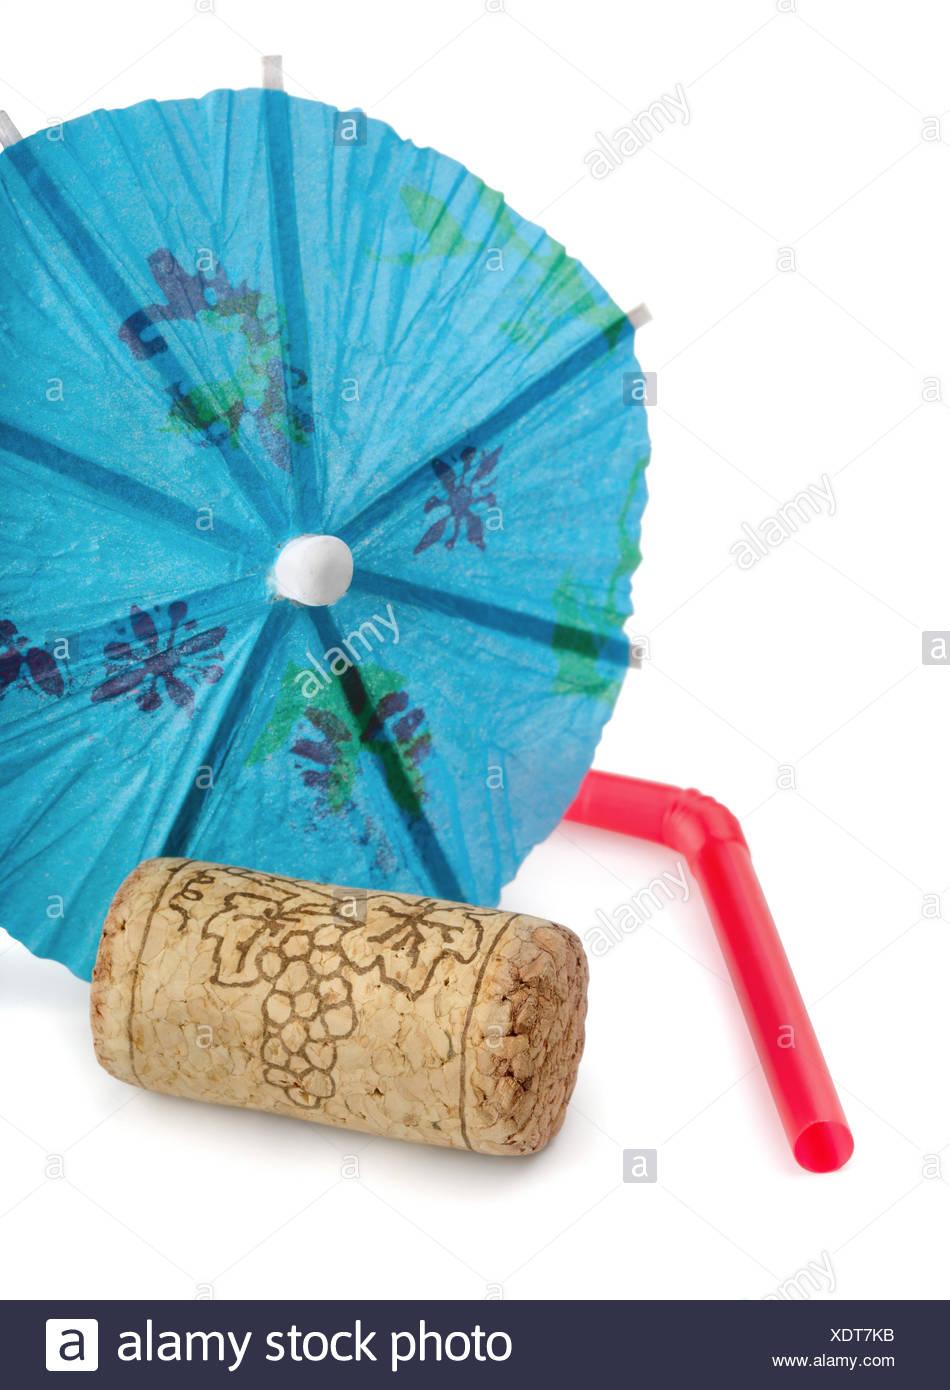 Cork, umbrella and straw - Stock Image